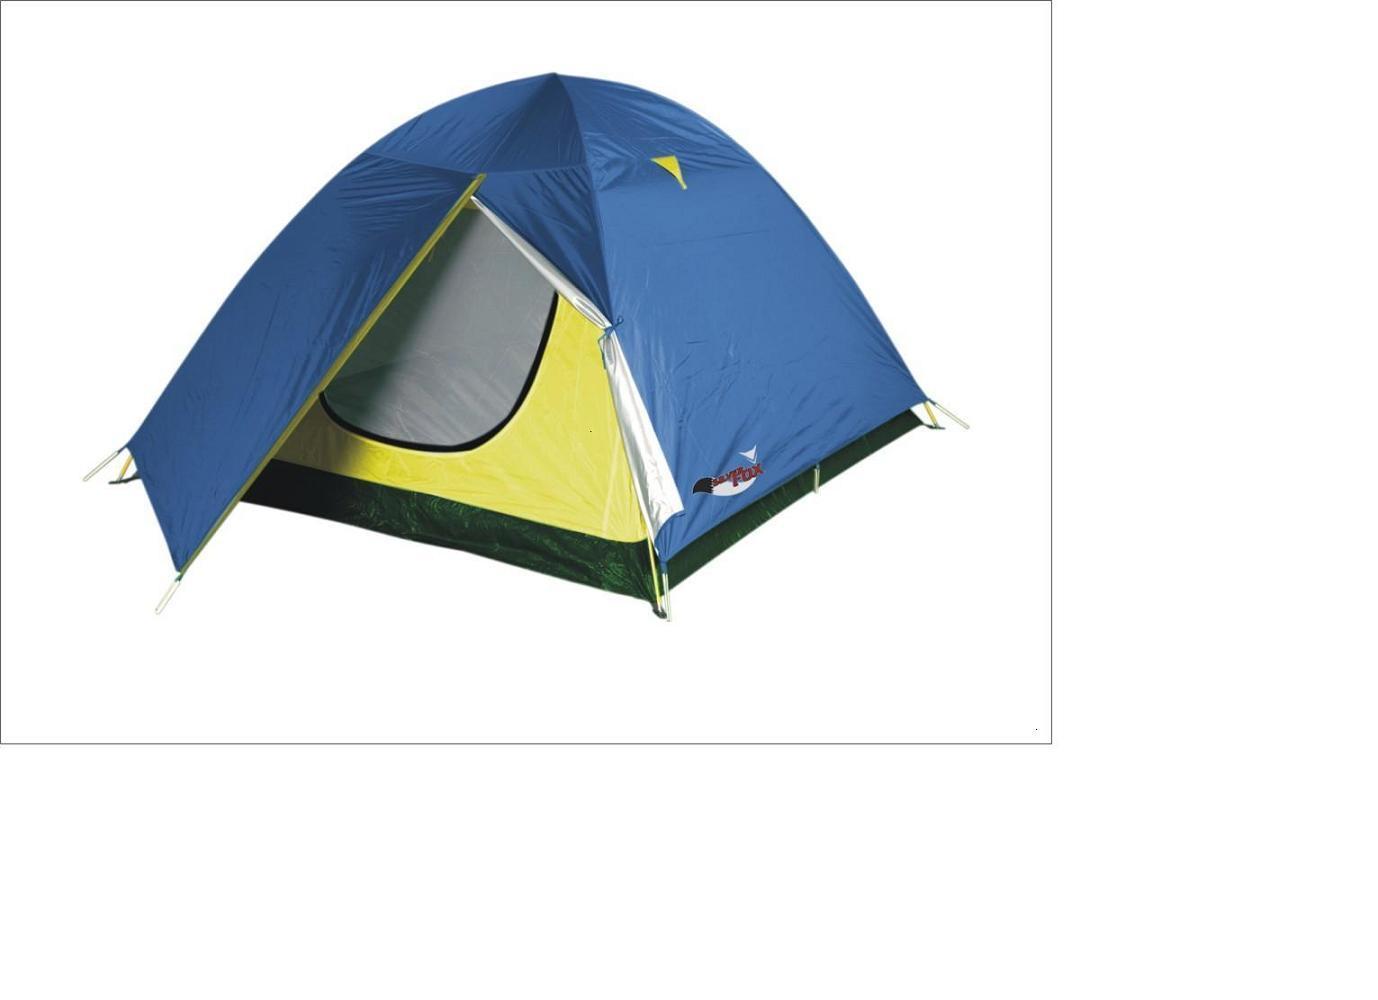 Cheap Camping Equipment Discount Camping Gear Cheap ml